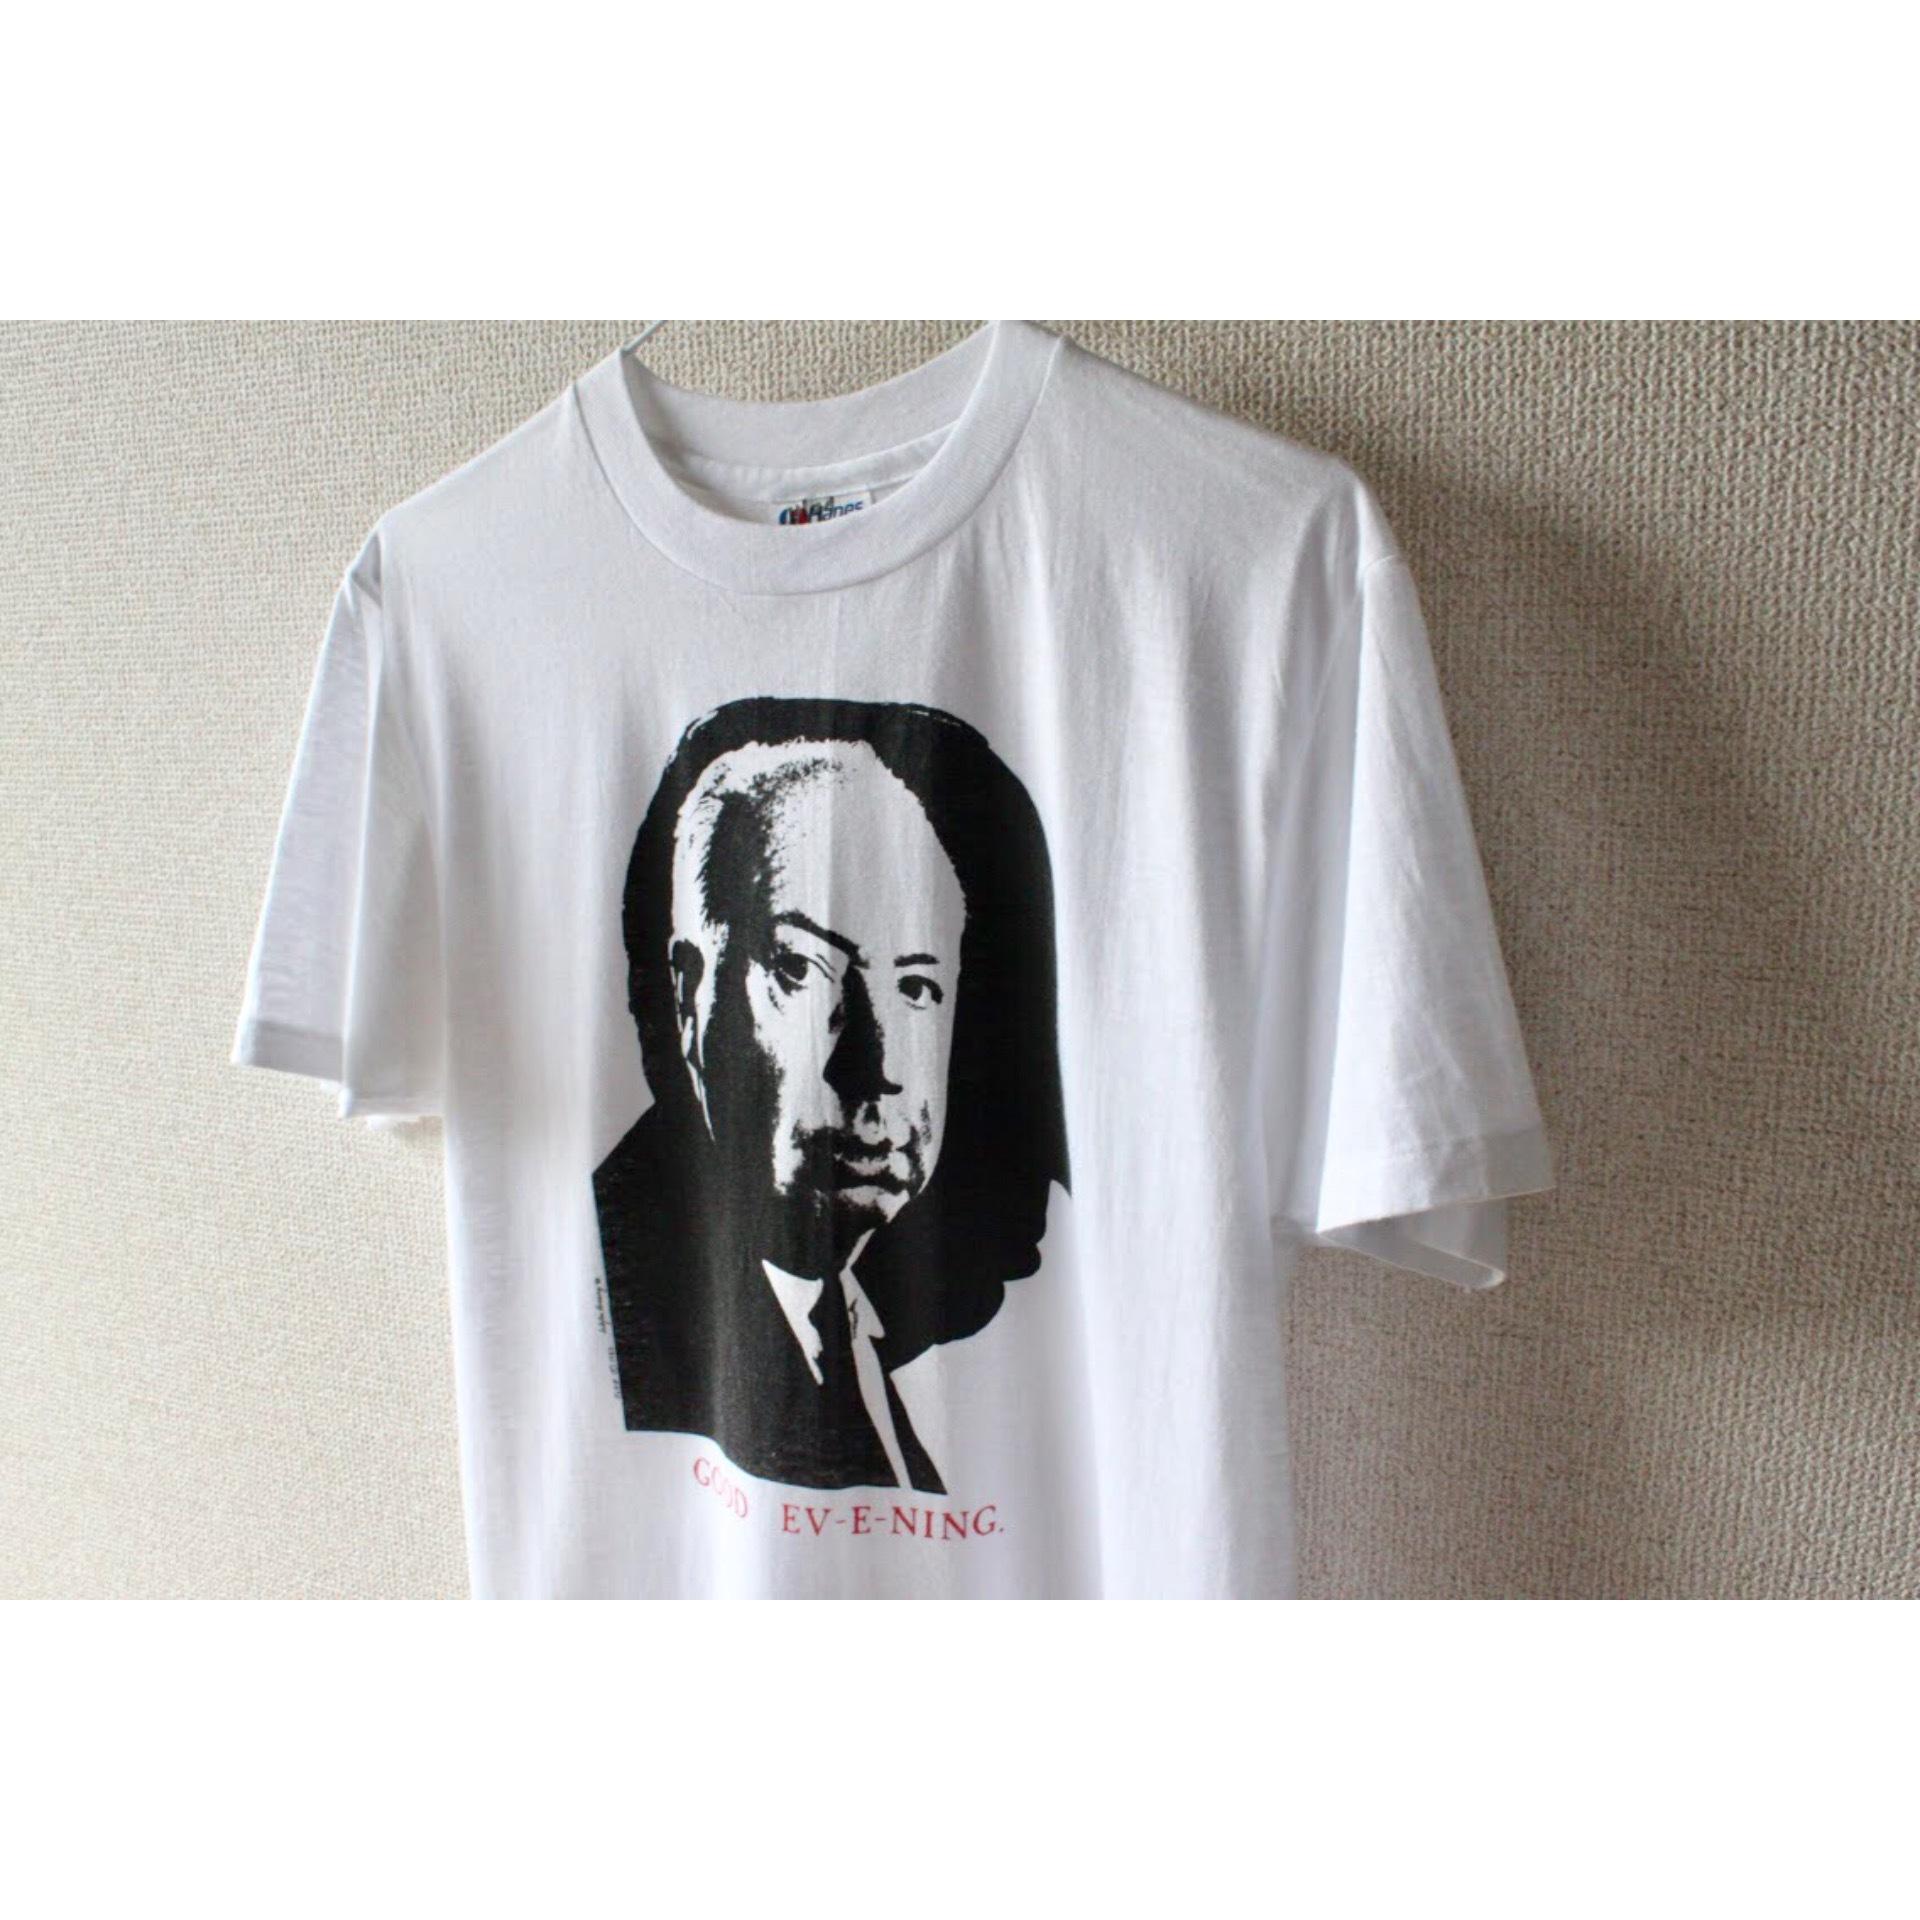 Vintage Alfred Hitchcock t shirt